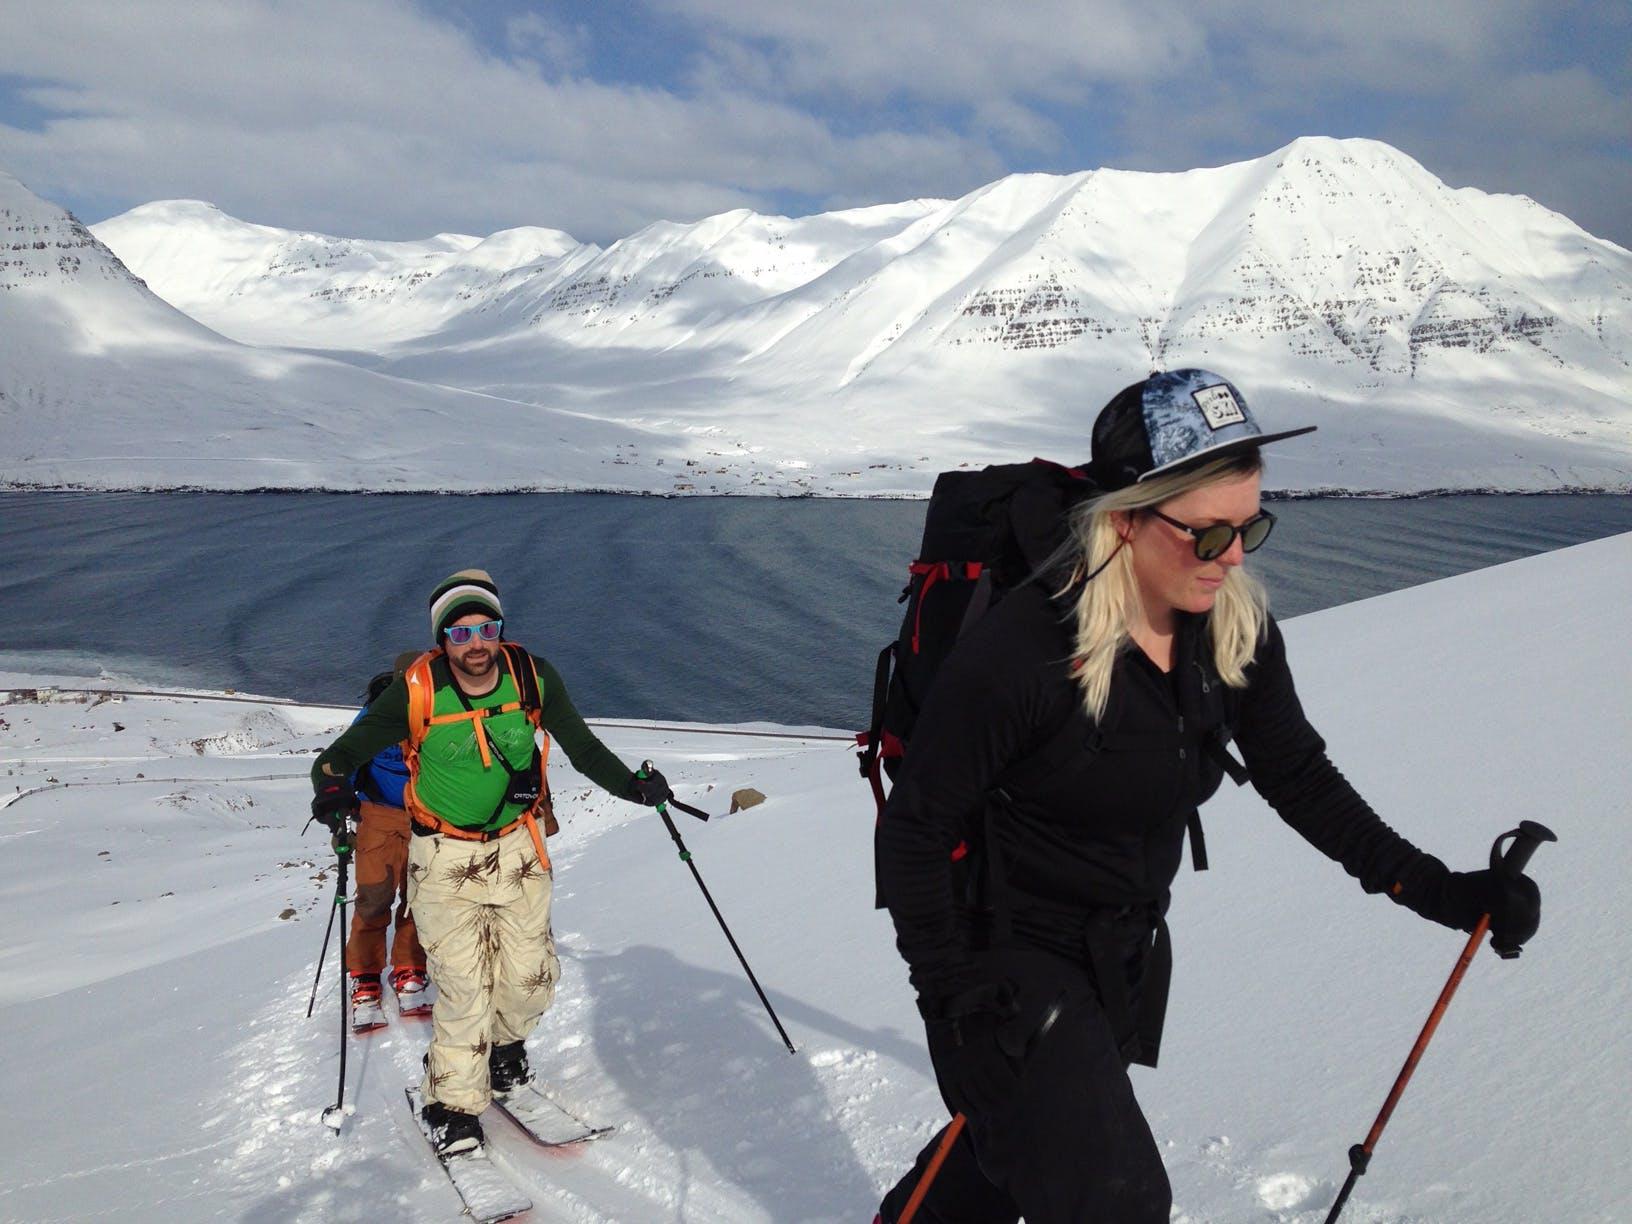 Splitboarders hiking fjords Iceland